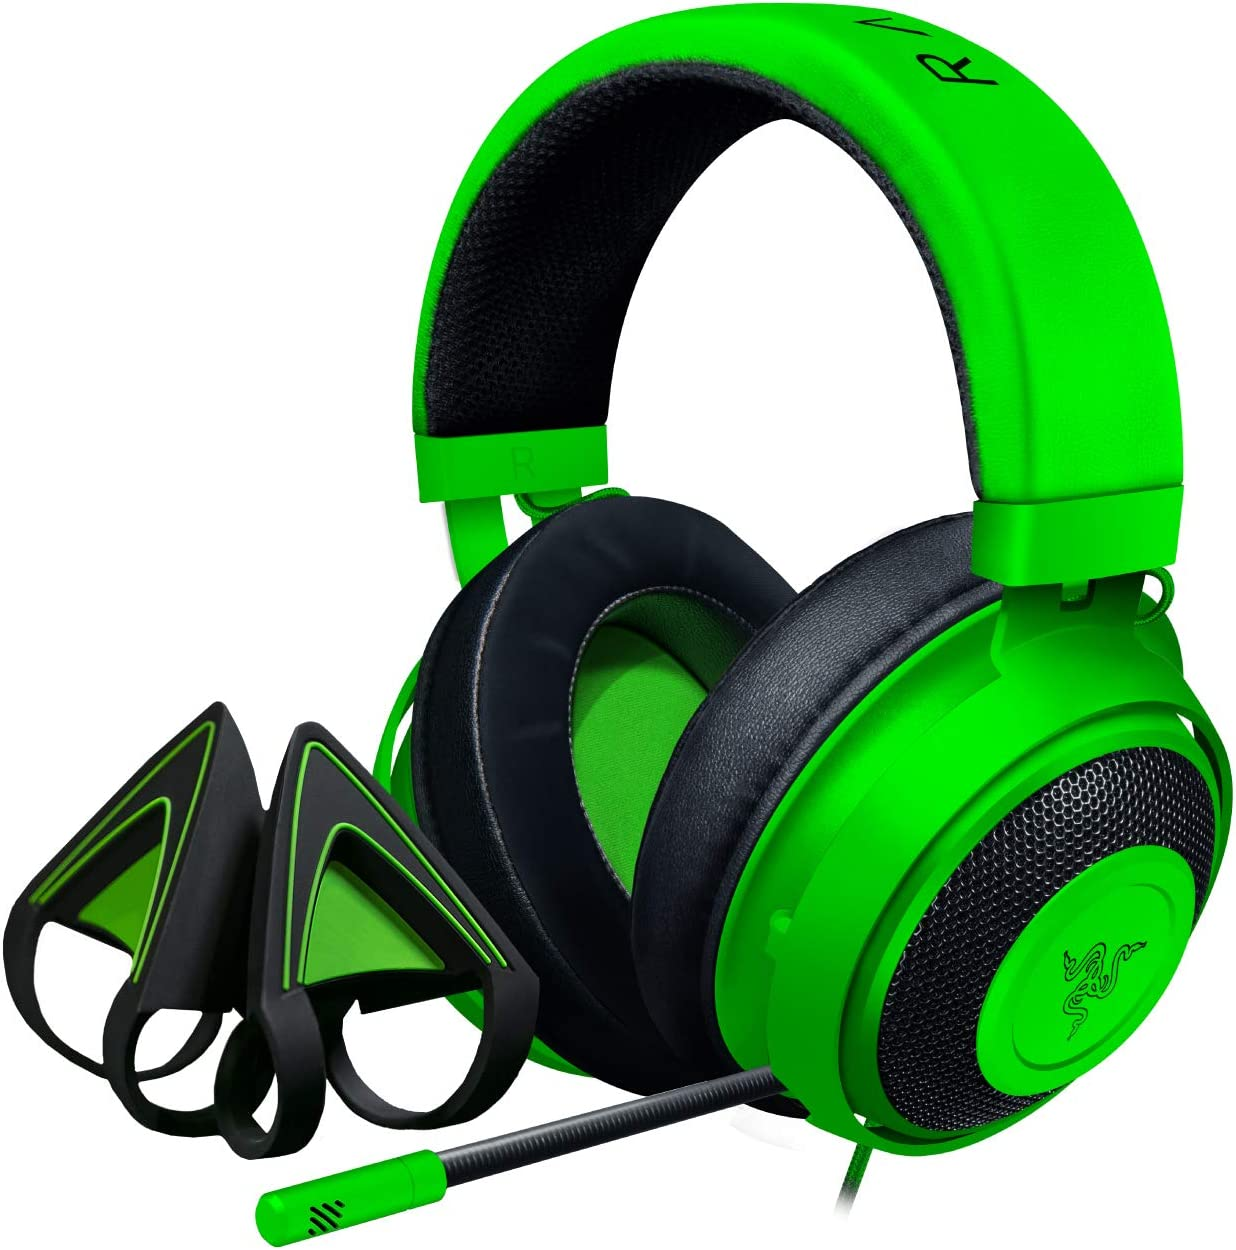 Razer Kraken Gaming Headset + Kitty Ears Bundle: Lightweight Aluminum Frame - Retractable Noise Cancelling Mic - for PC, PS4, Nintendo Switch - Green